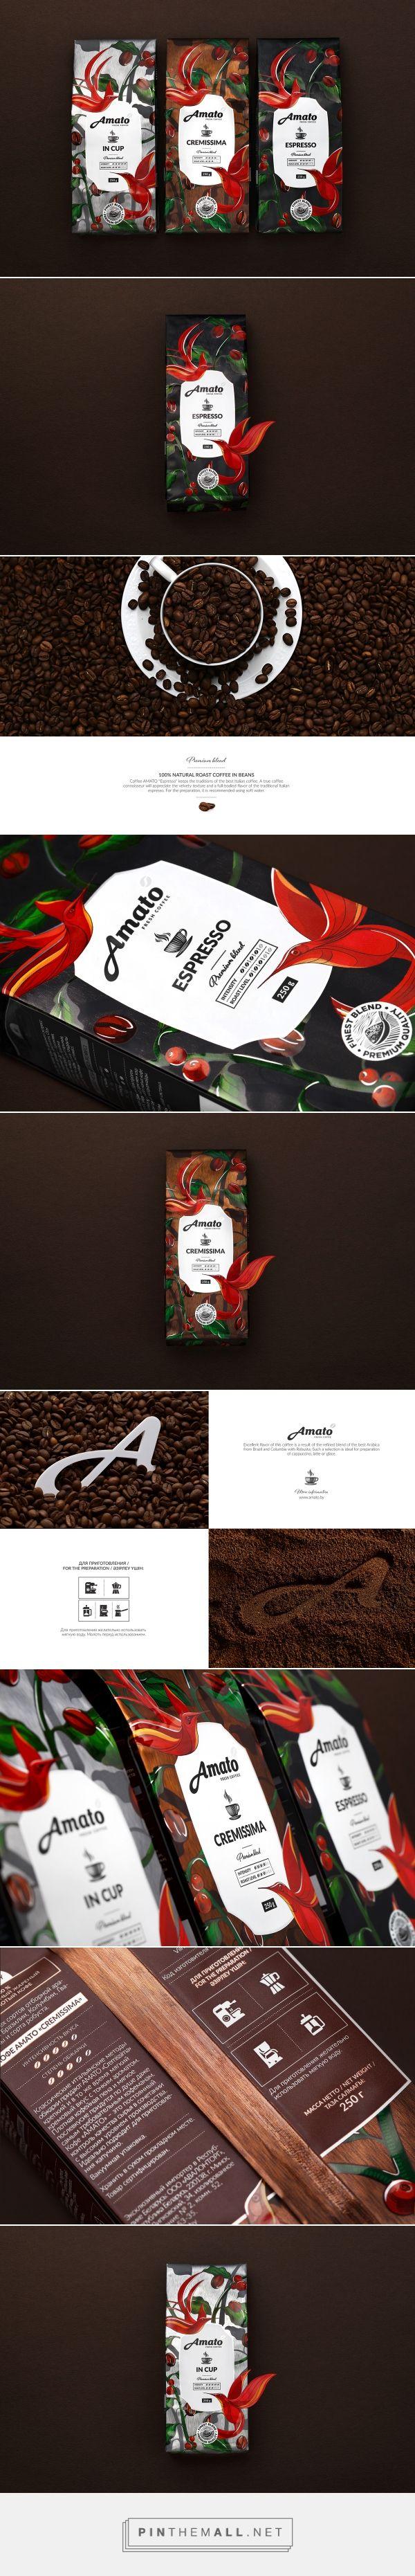 Amato Coffee packaging design by Fabula - http://www.packagingoftheworld.com/2016/10/amato-coffee.html